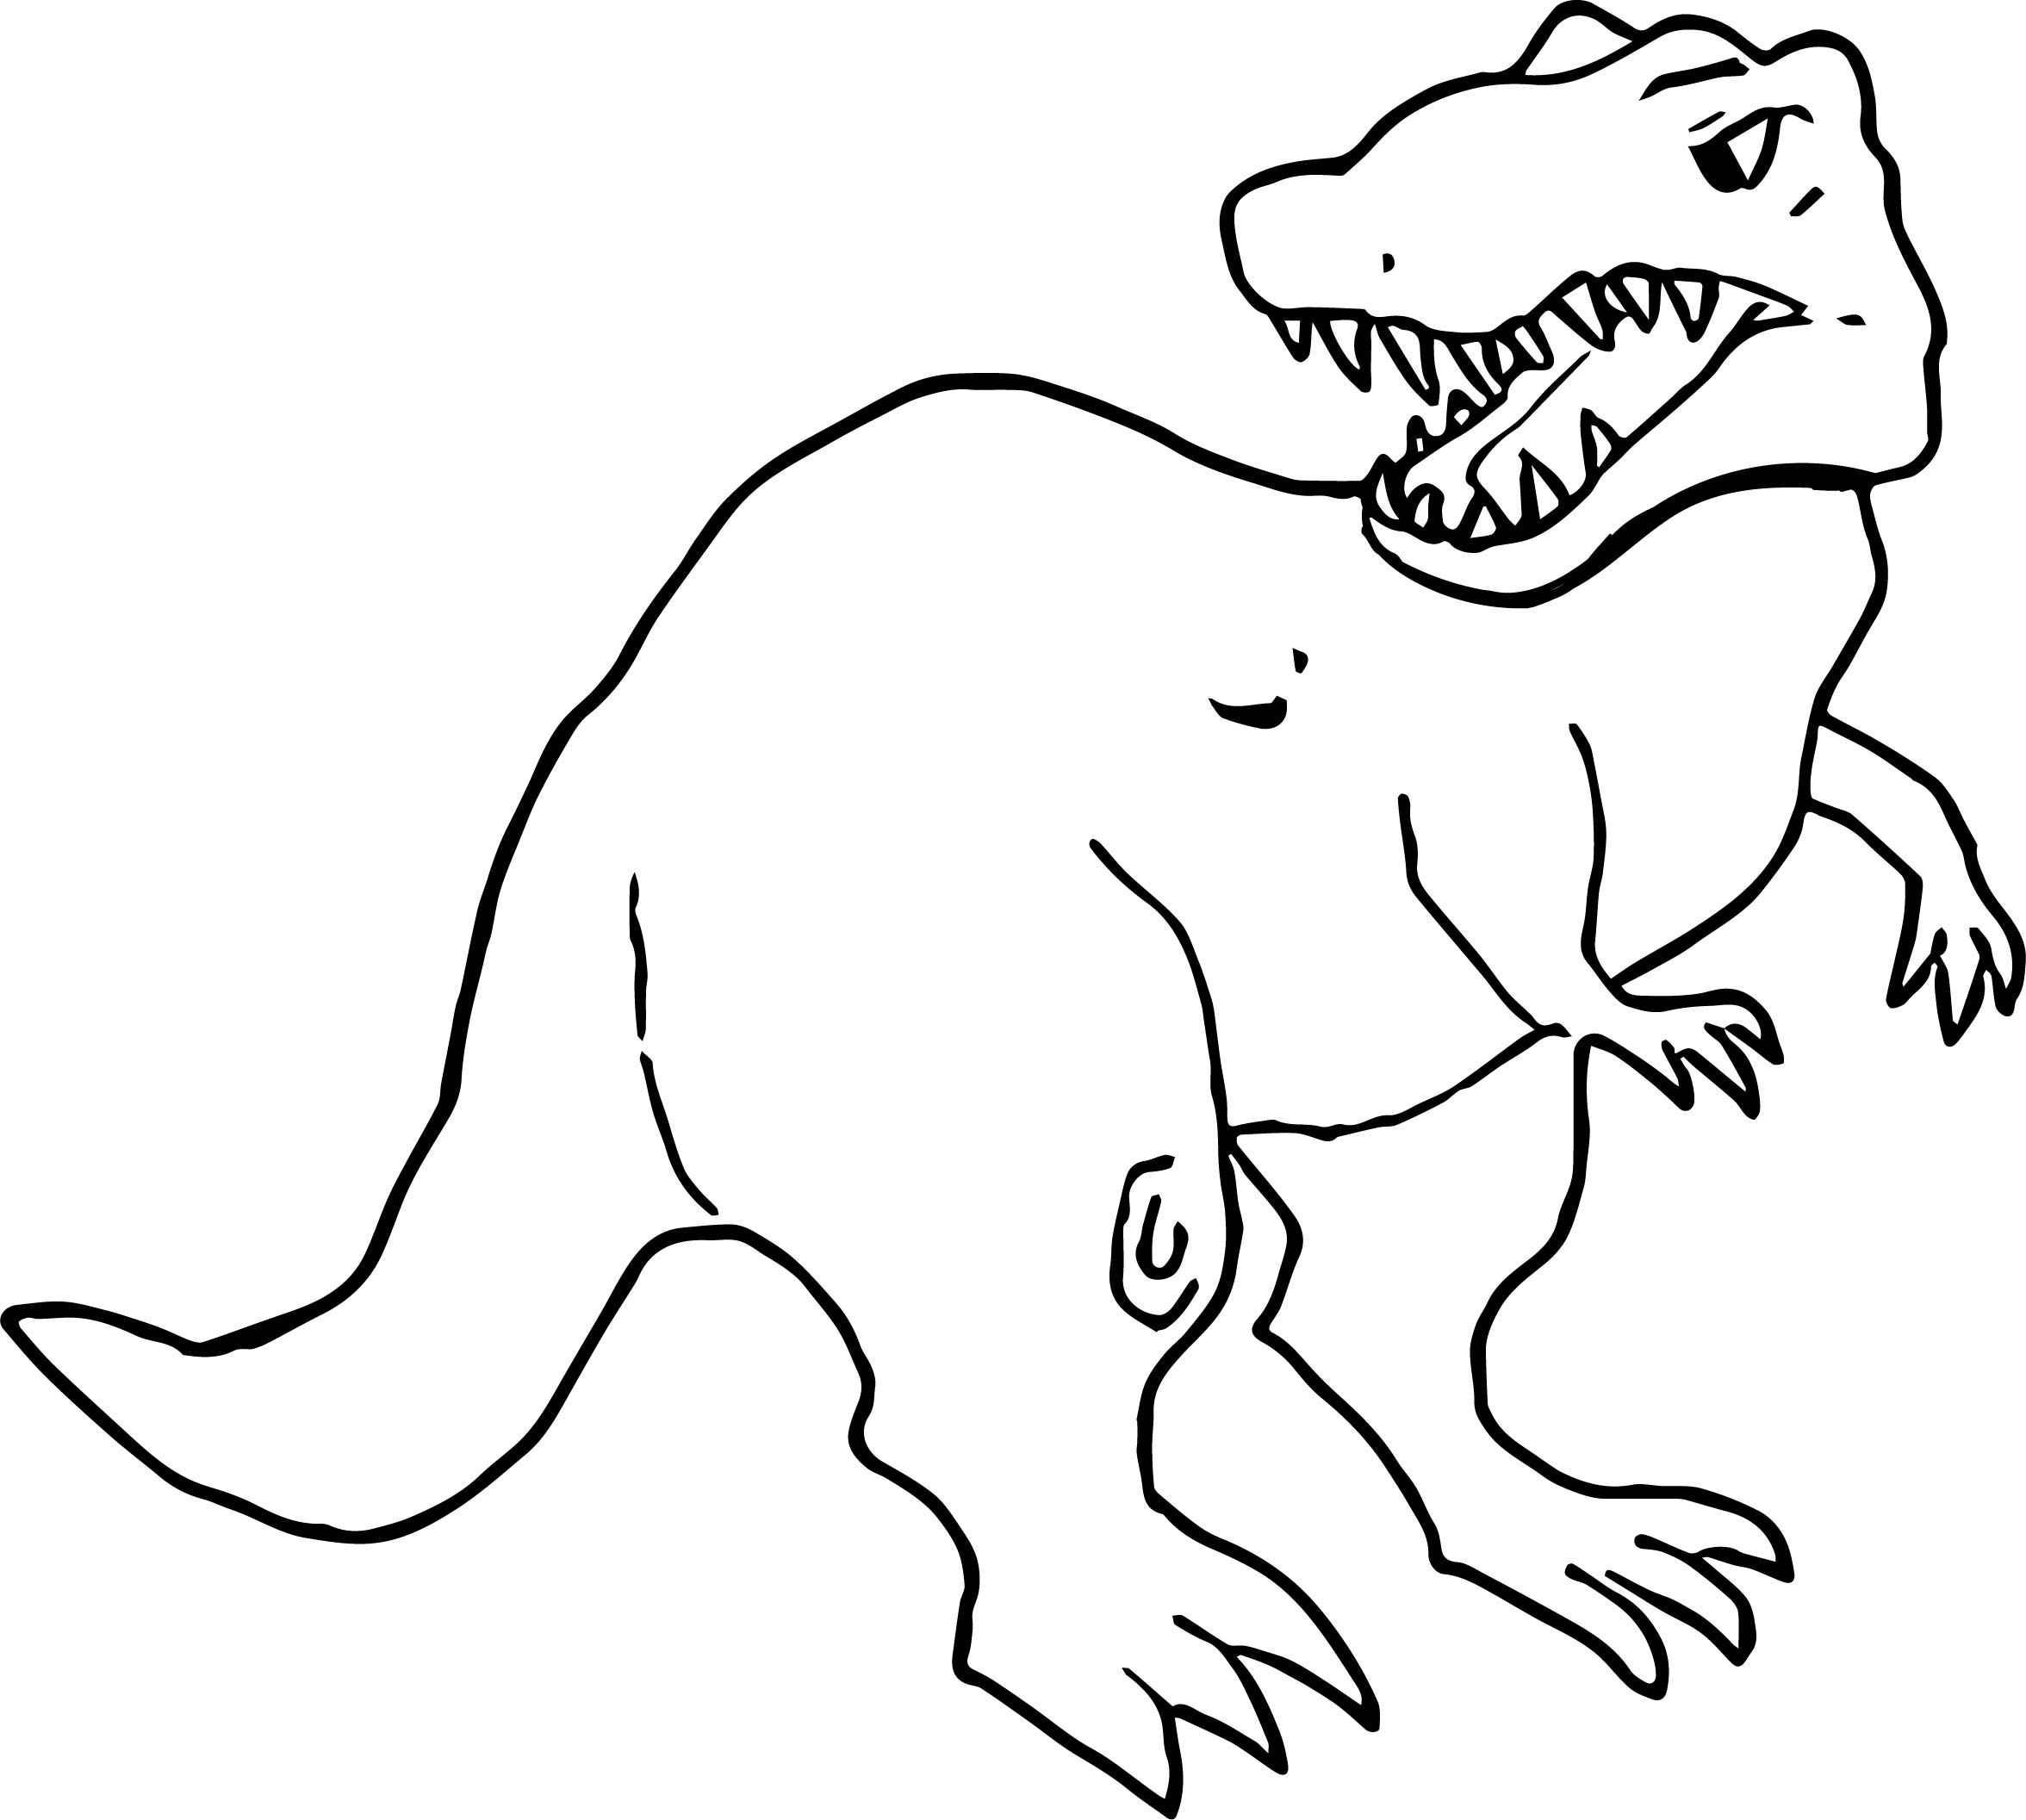 Dinosaur Tyrannosaurus Rex Color Coloring Page Wecoloringpage